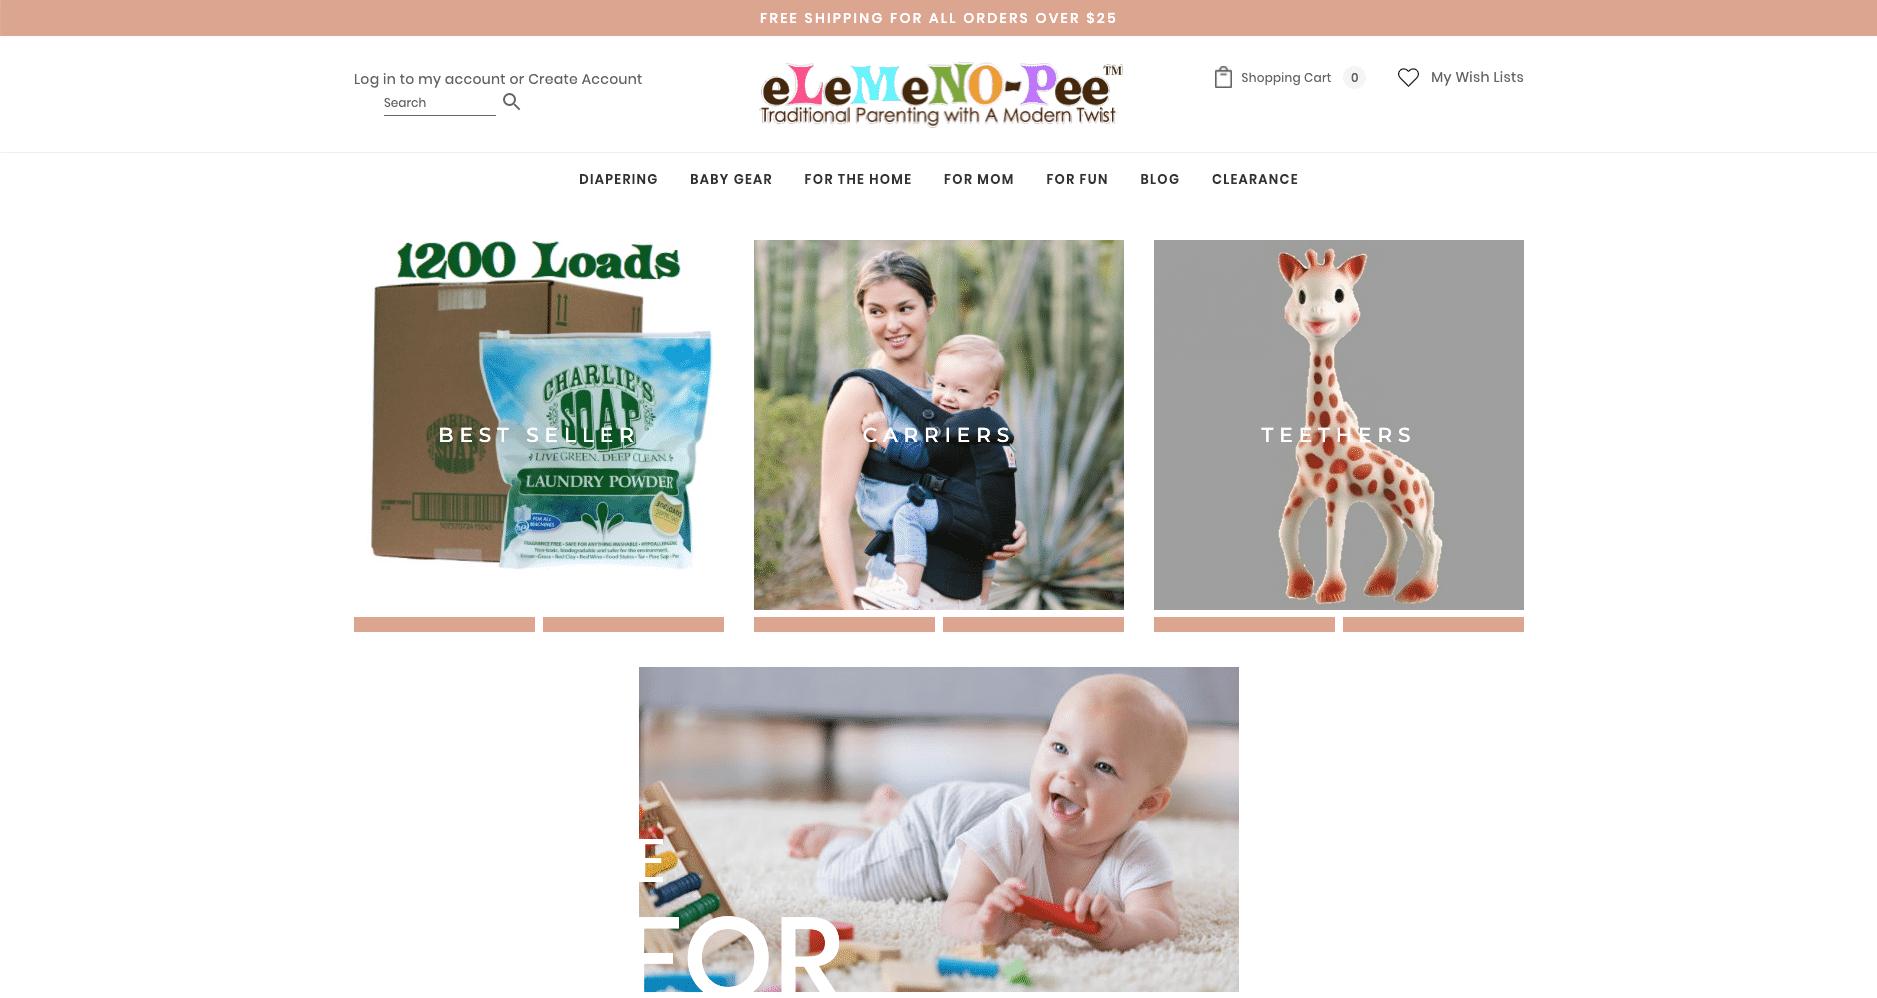 eLeMeNO-Pee, produtos modernos para a parentalidade